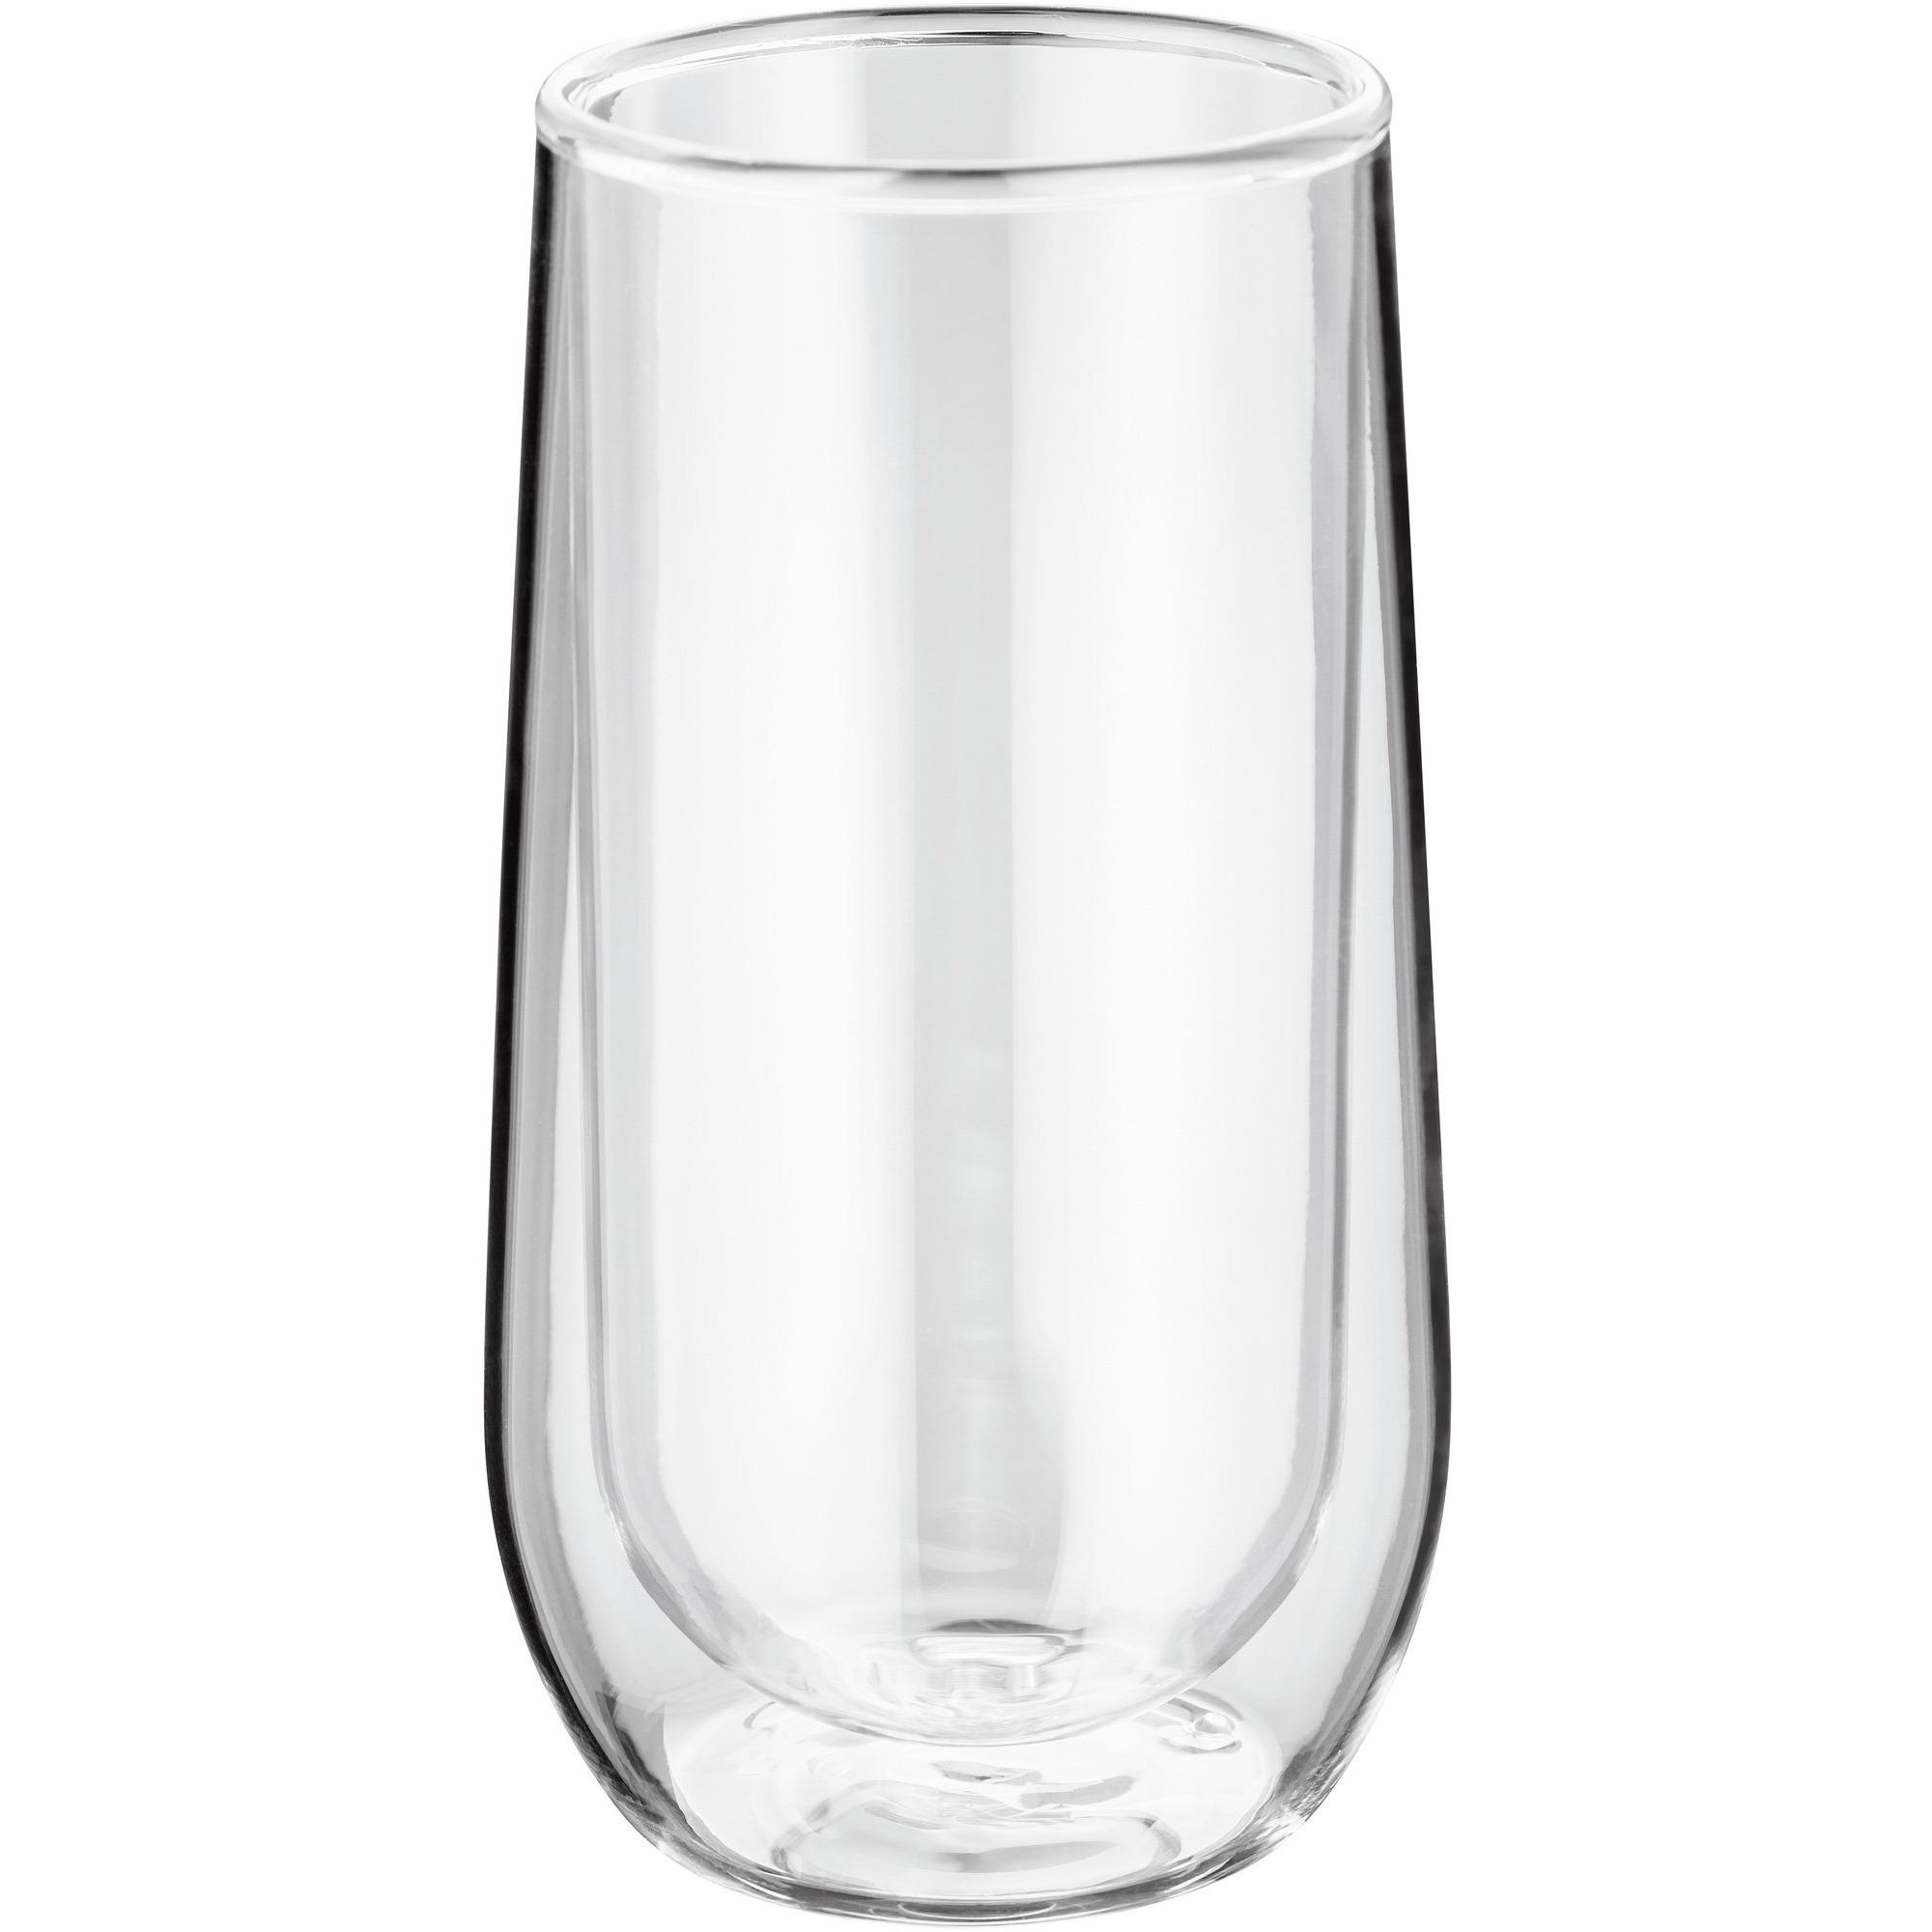 Horwood Dubbelväggat glas 330ml 2 st